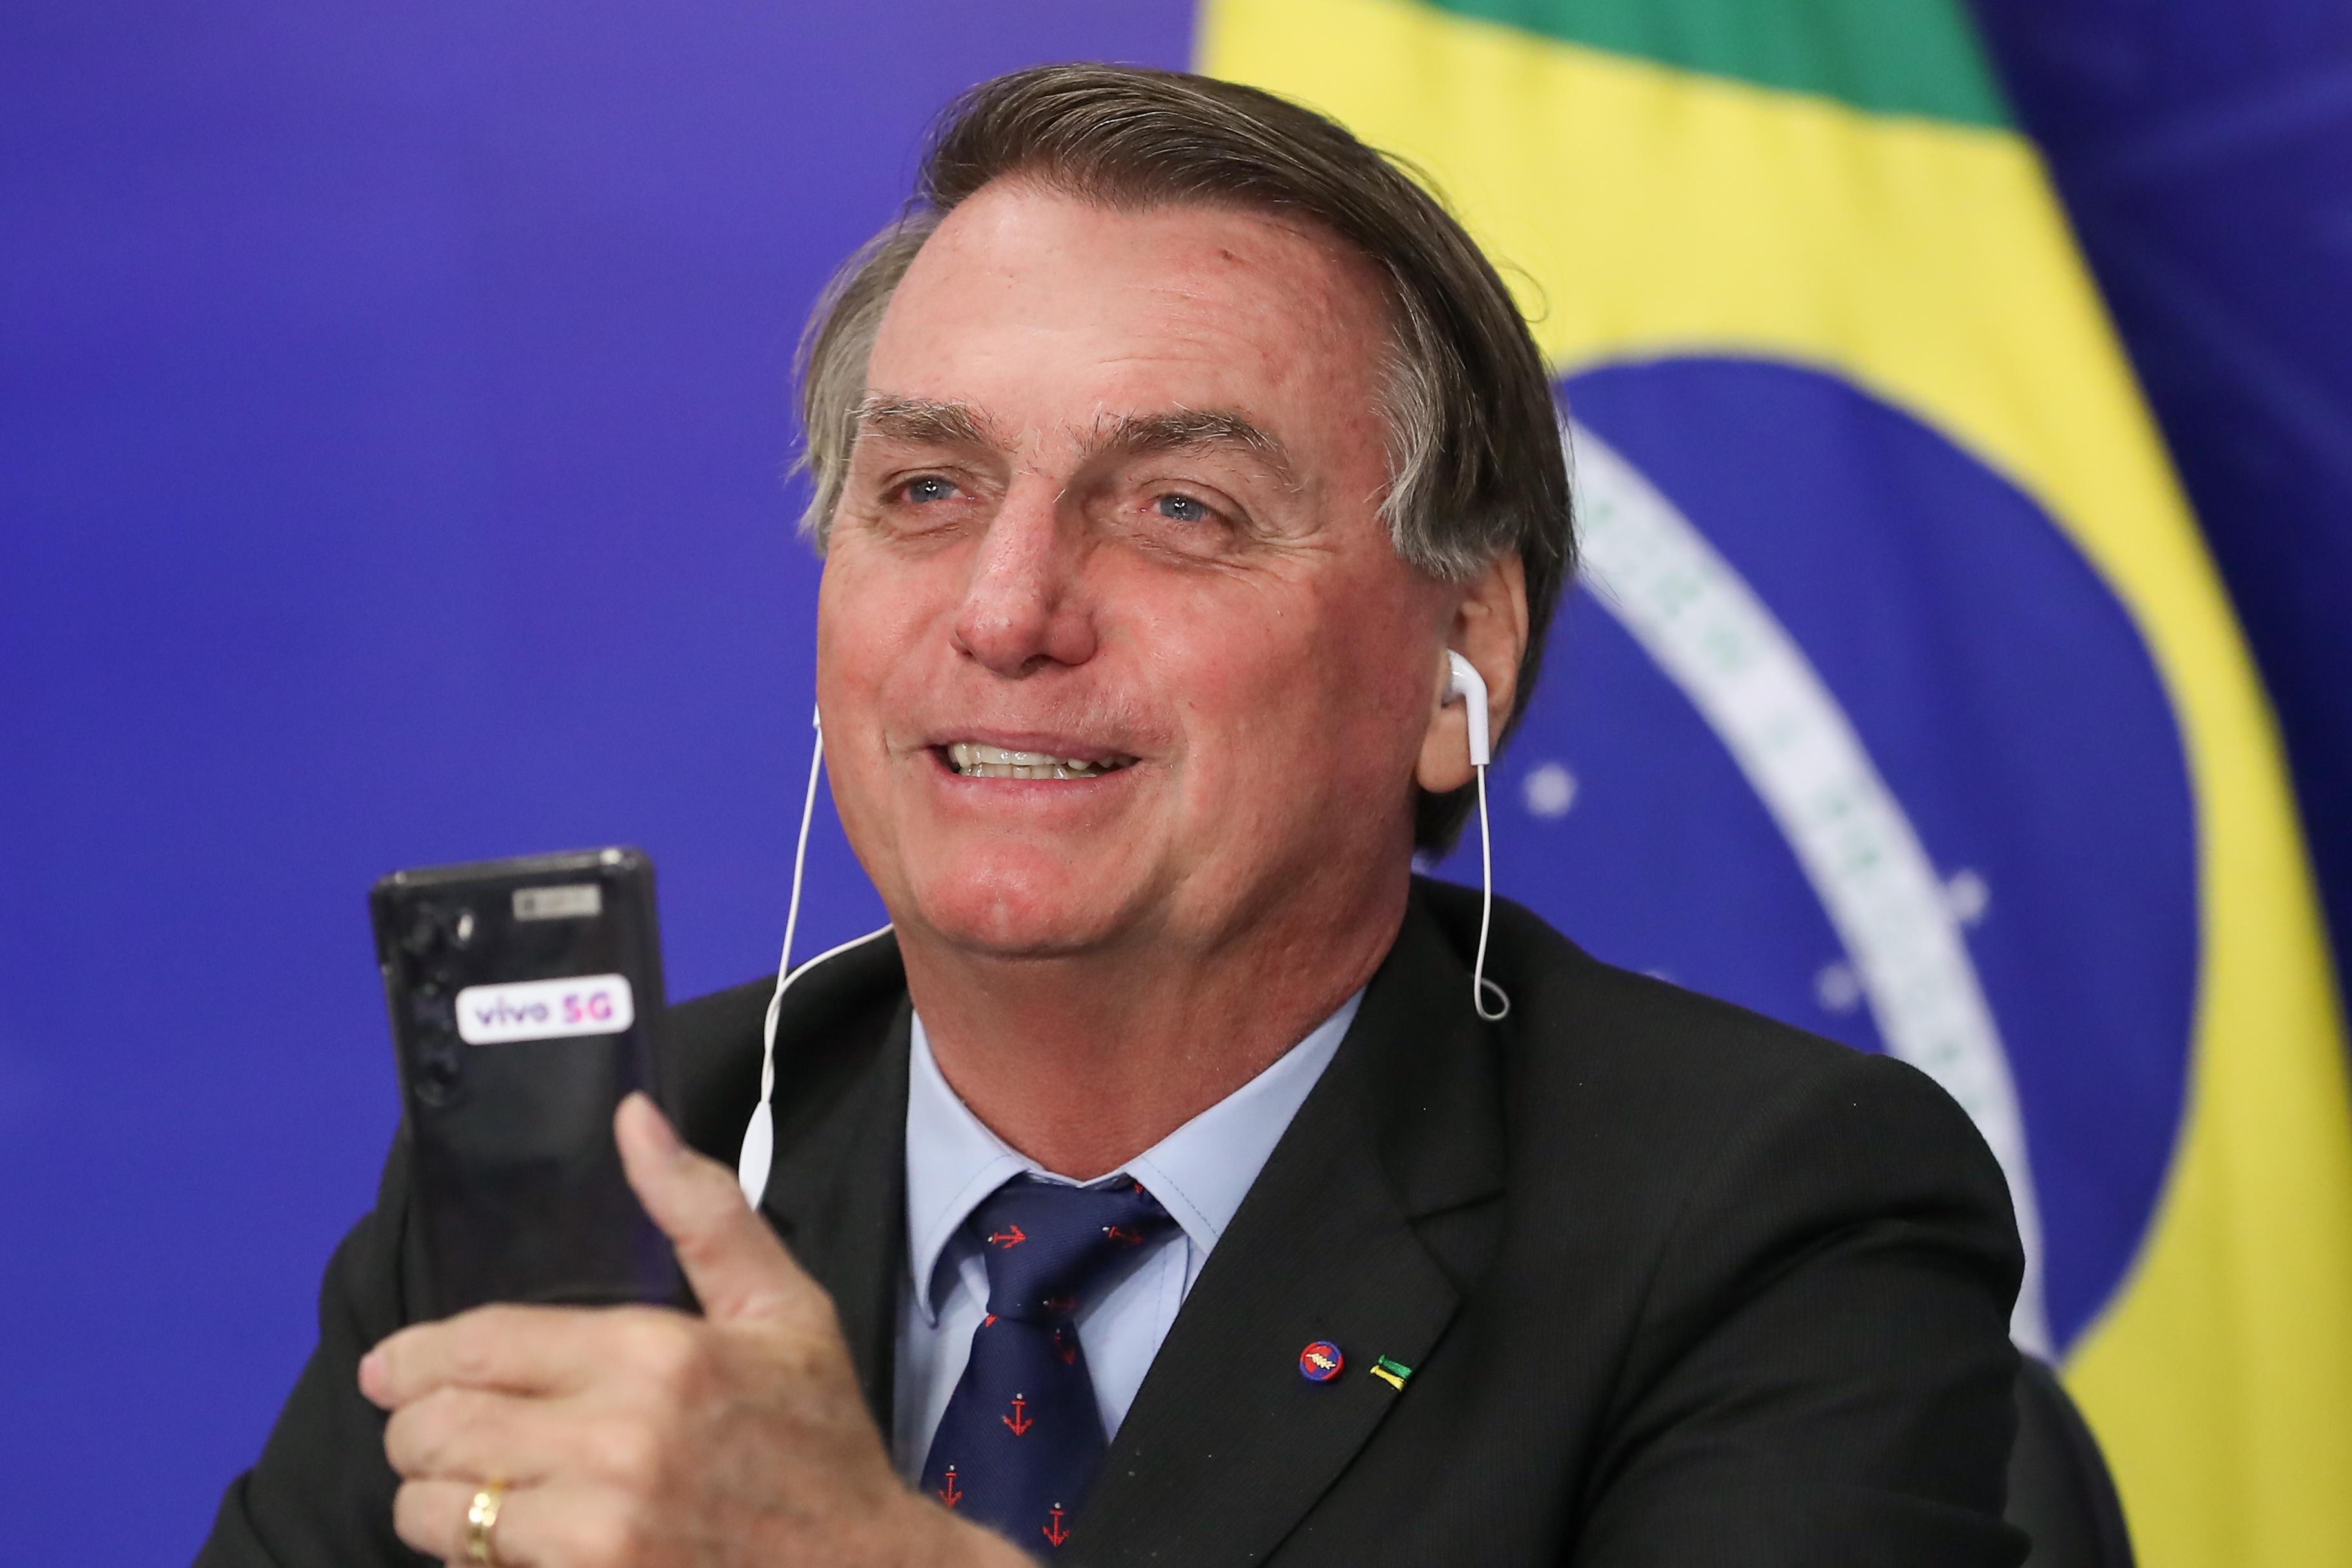 IMAGEM: Cidades brasileiras registram protestos pró-Bolsonaro